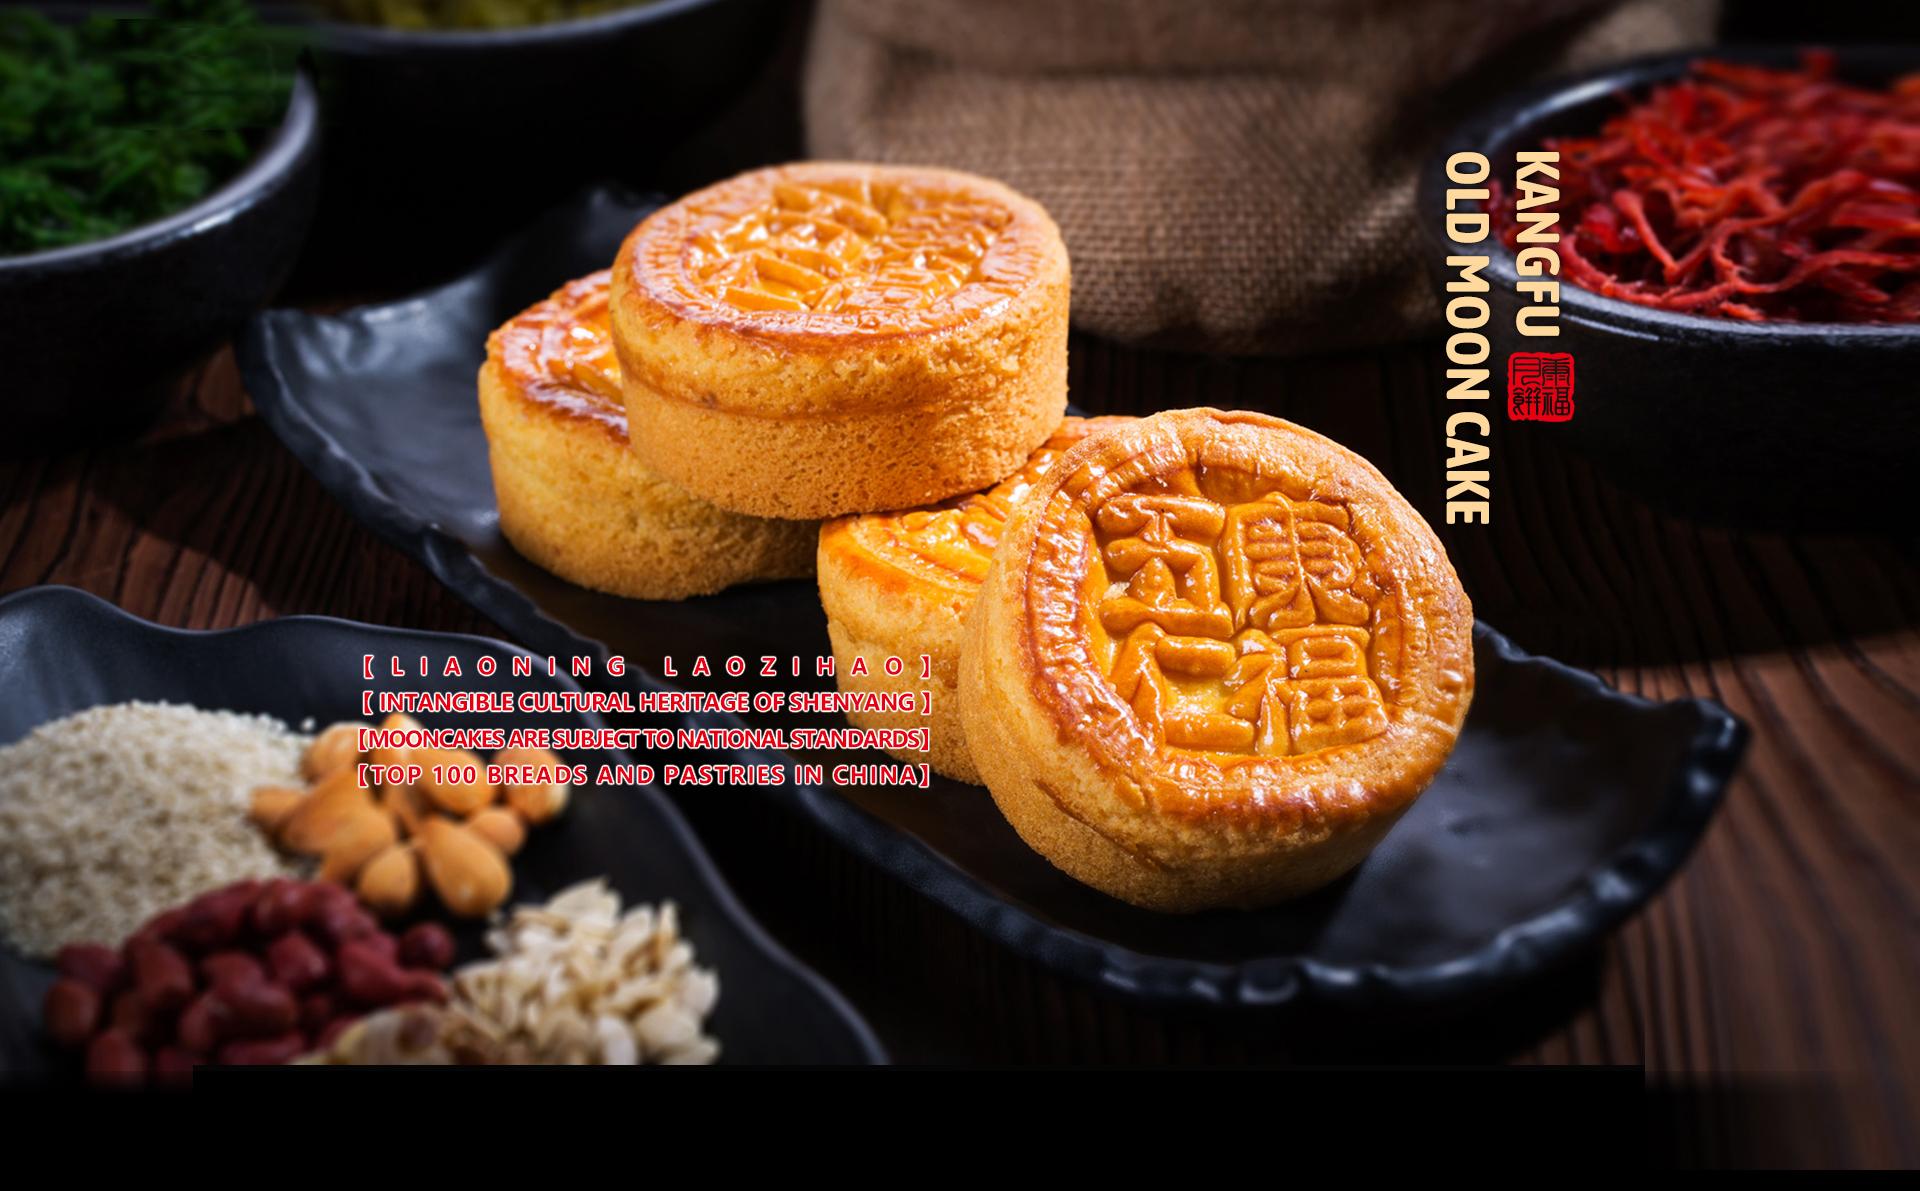 Kangfu pastry